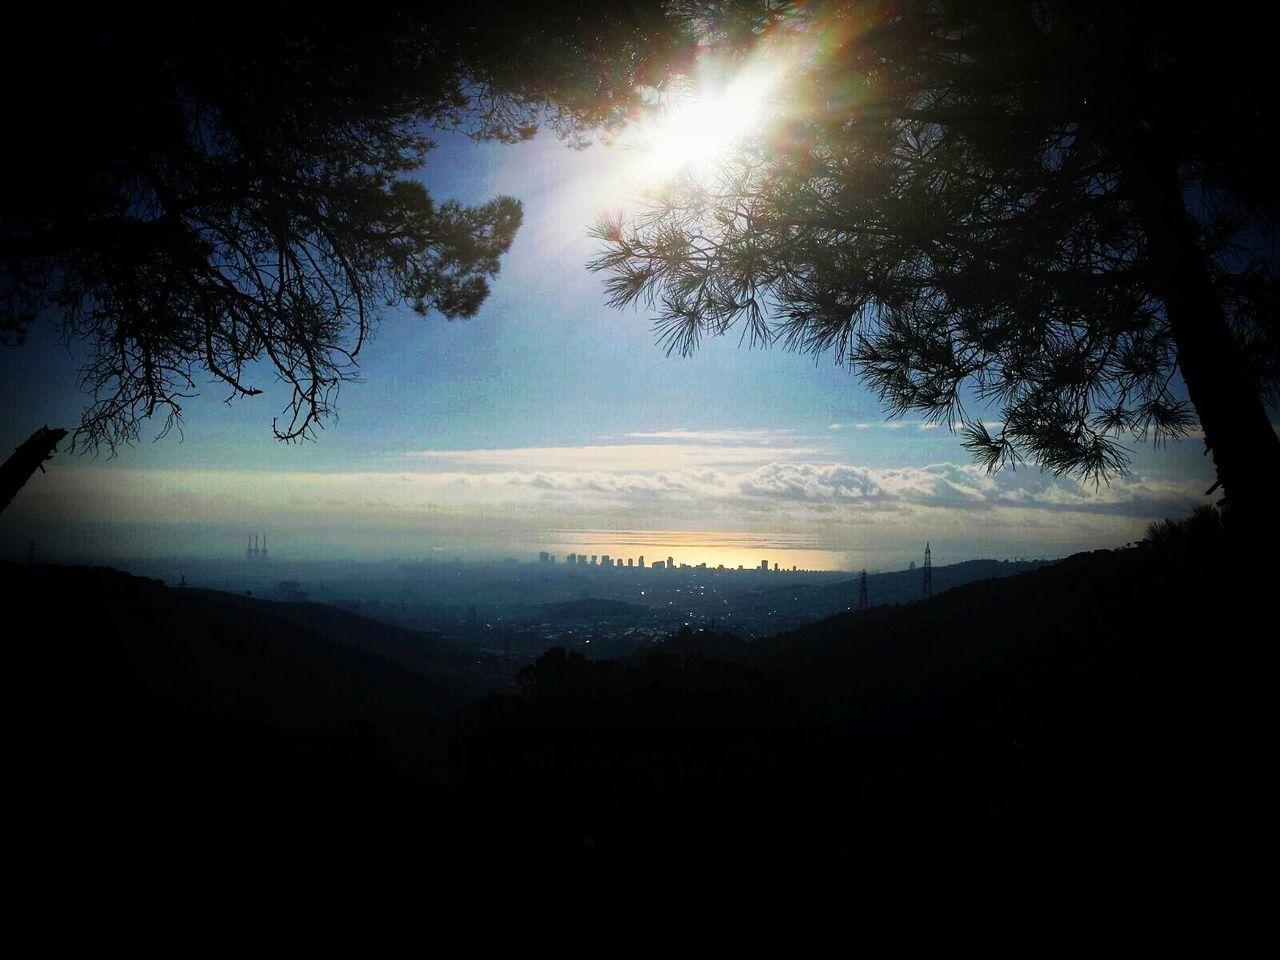 Photography Captura Photo♡ Tagstagram.app #winter #wintertime #fall #inverno #invierno #vinter #cold #winterwonderland #wonderland #snow #ice #freezing #instatalent #ilovewinter #winterscoming #love #freddo #igs #instagood #picoftheday #all_pixs #bestseason #instagold #tagsta_natu FotoDelDia Fotografia Cielo Y Nubes  Cielo Azul Capture The Moment Barcelonacity Photooftheday Fotodeldia_ Photo Of The Day Photos Refex Capture Bosque Y Vida Mountains Barcelonainspira Barcelona, Spain Barcelona City Panoramic Photography Cielo Vistas